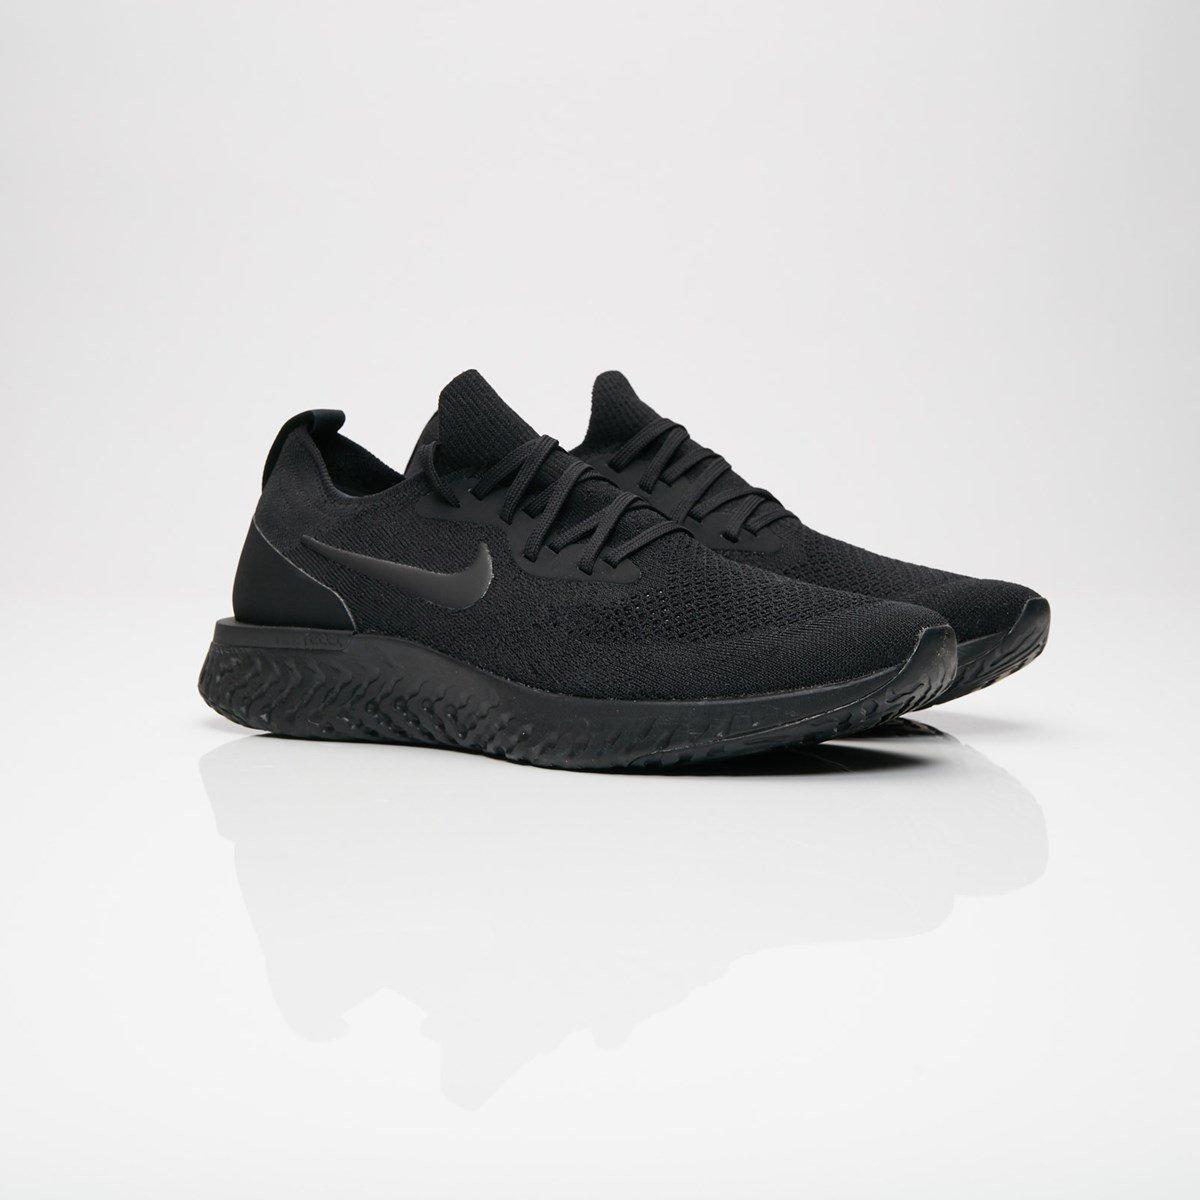 san francisco dc881 6db6a nike epic react flyknit aq0067 003 sneakers   streetwear på nätet sen 1999